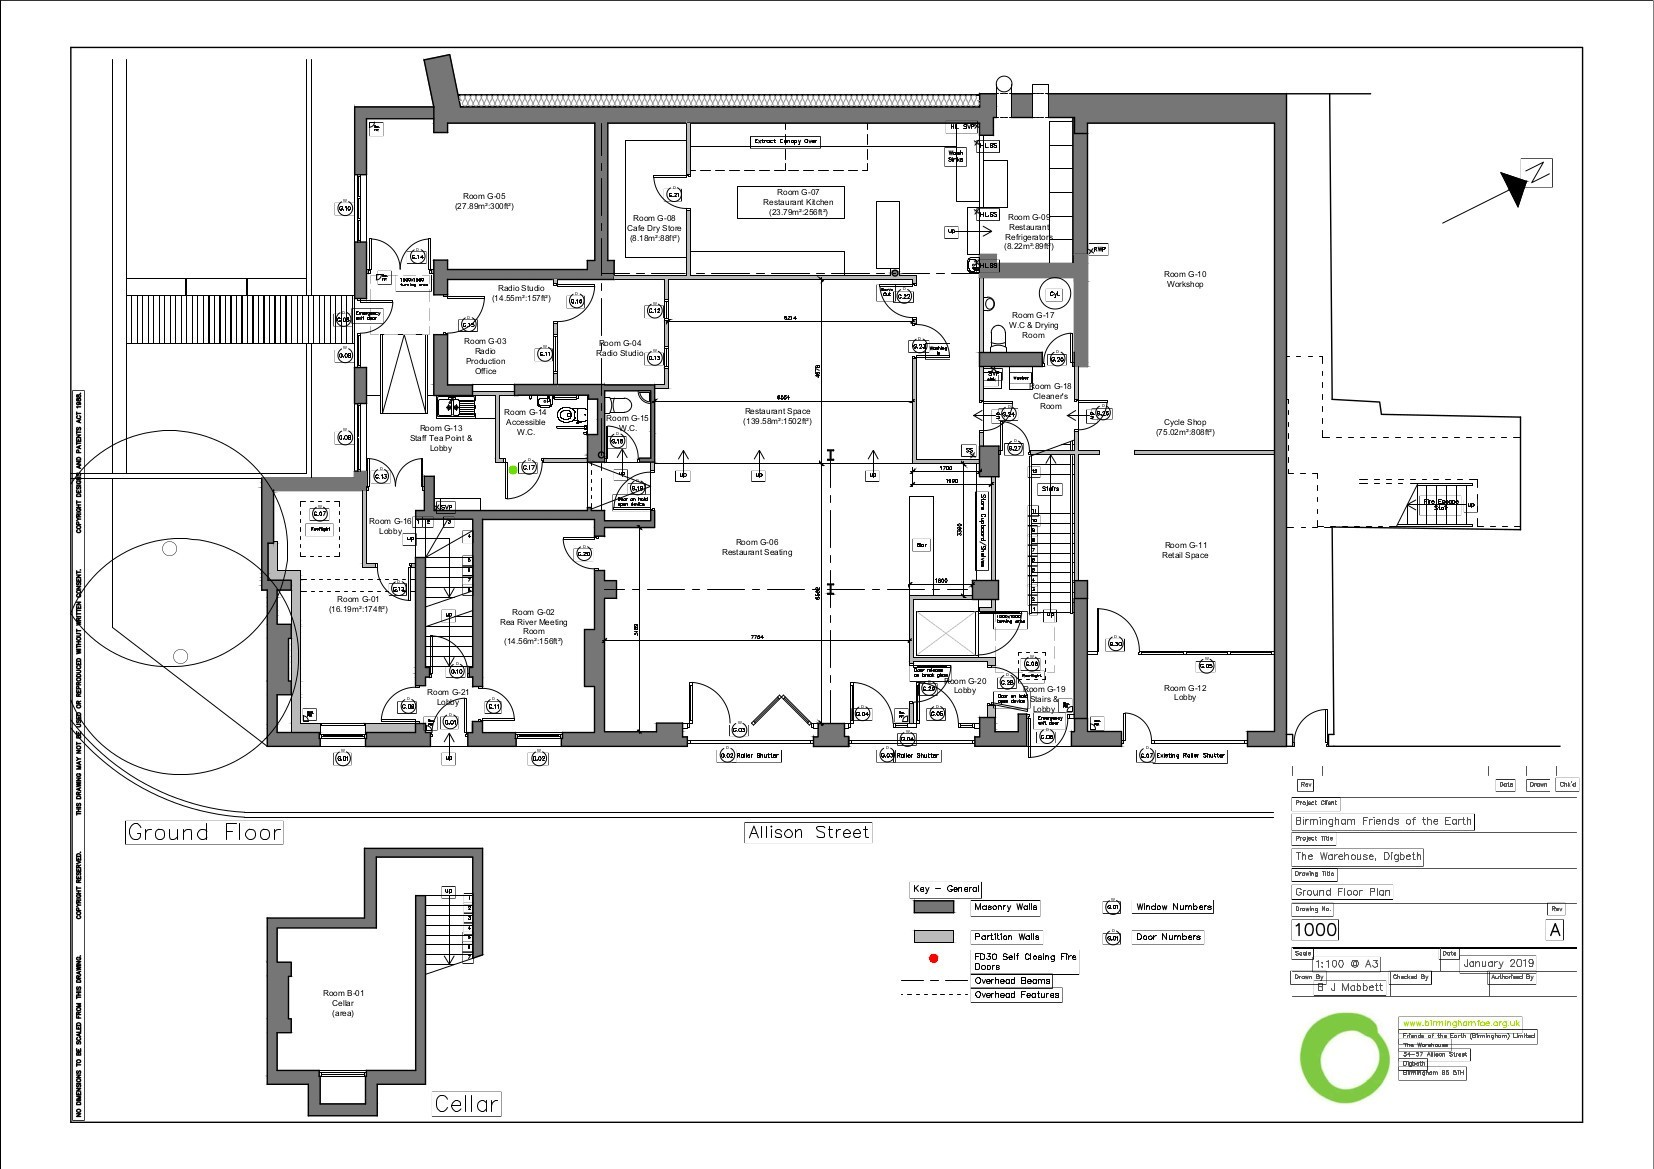 Architectual floor plan